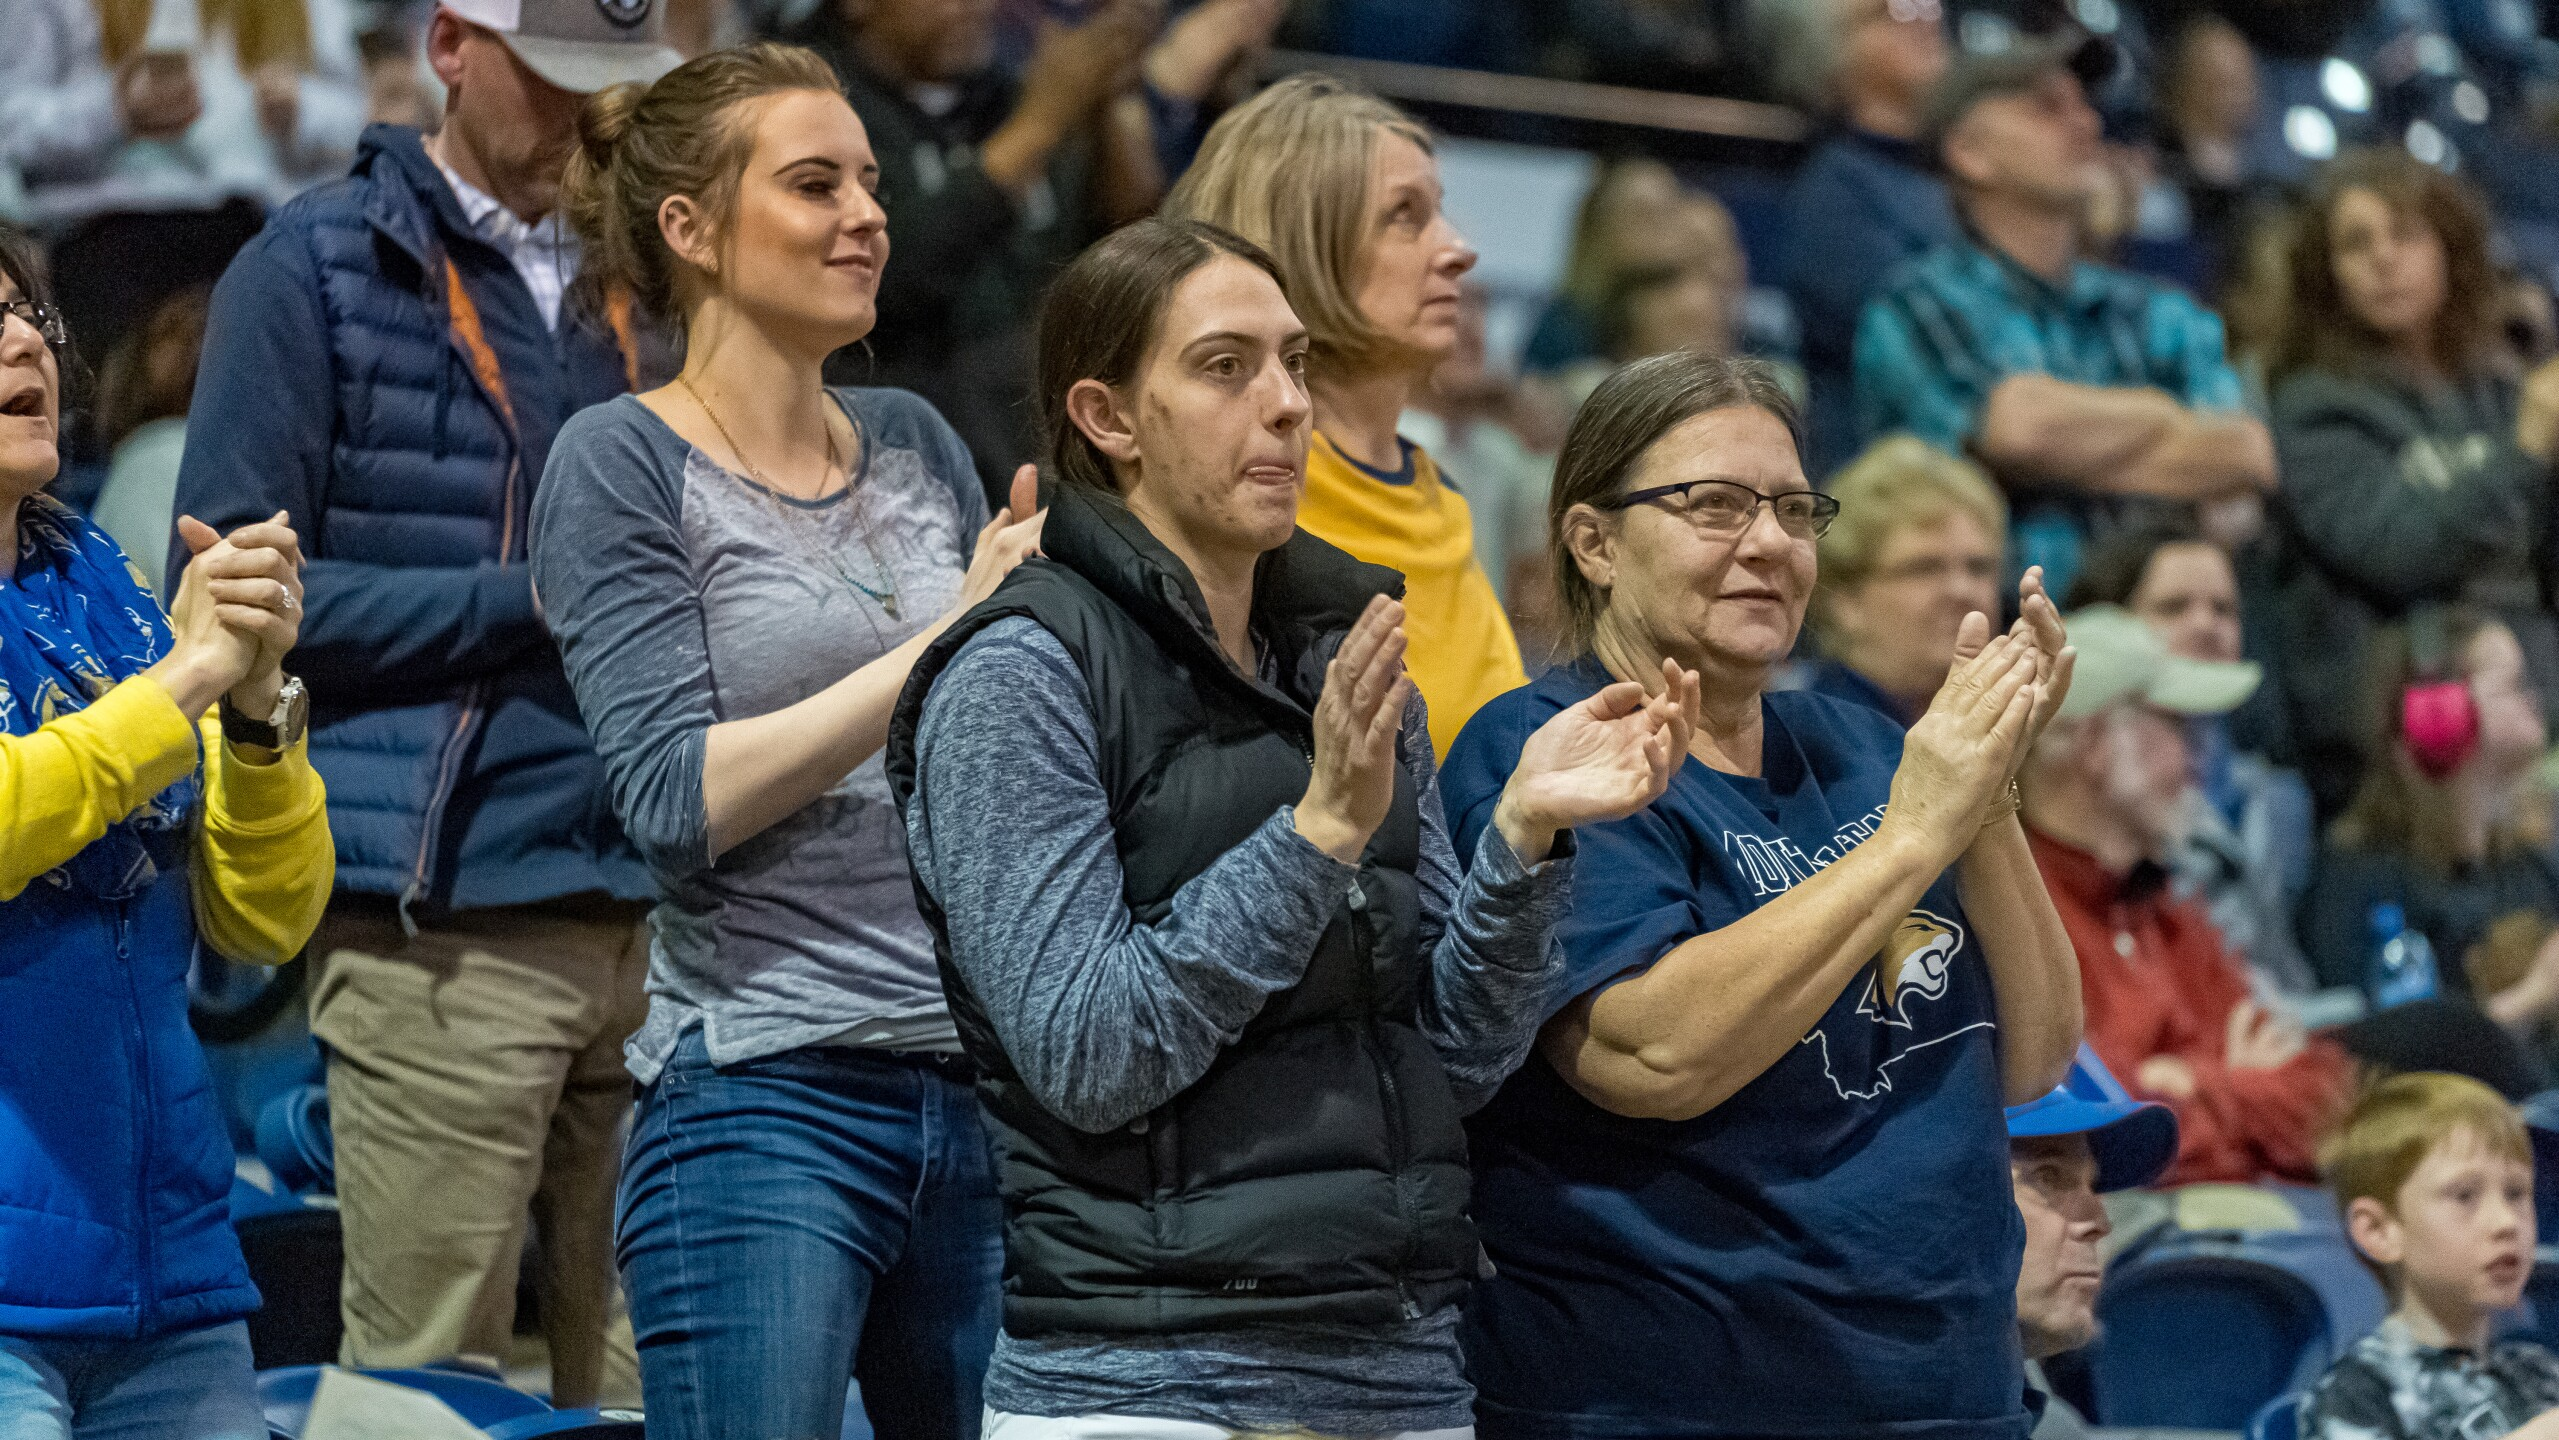 Montana State Bobcats basketball fans